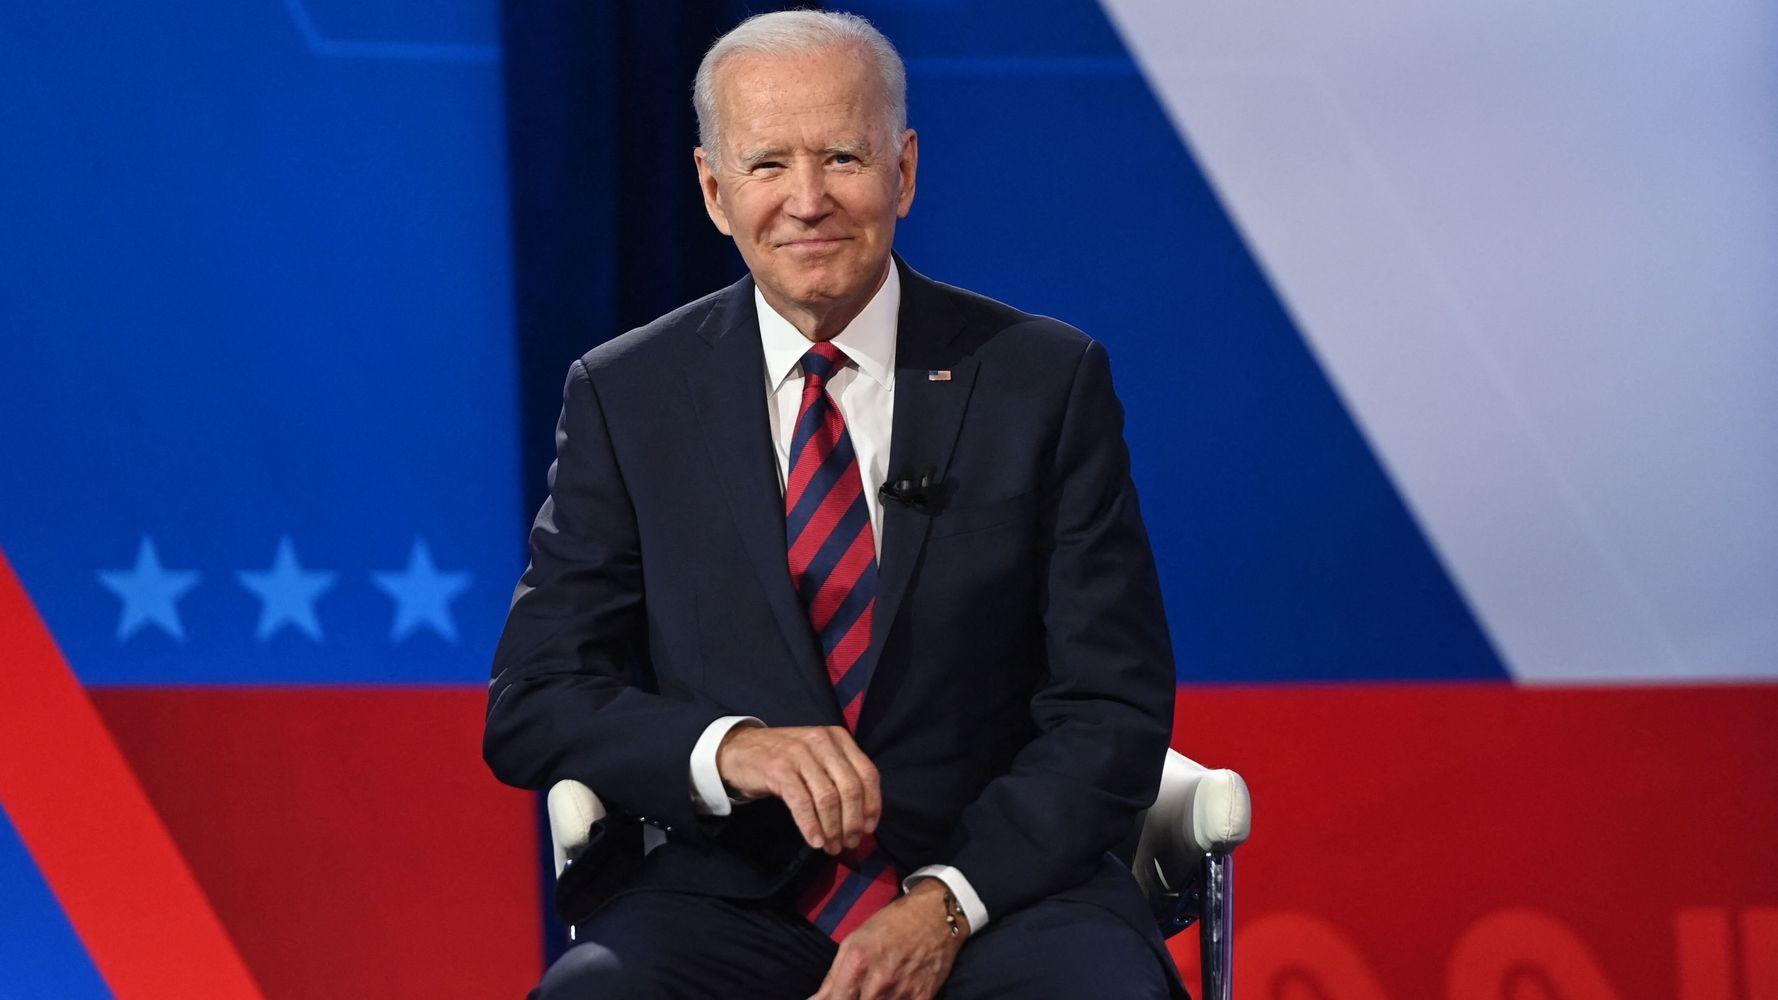 Biden Says 'Nothing Will Get Done' If Senate Abolishes Filibuster